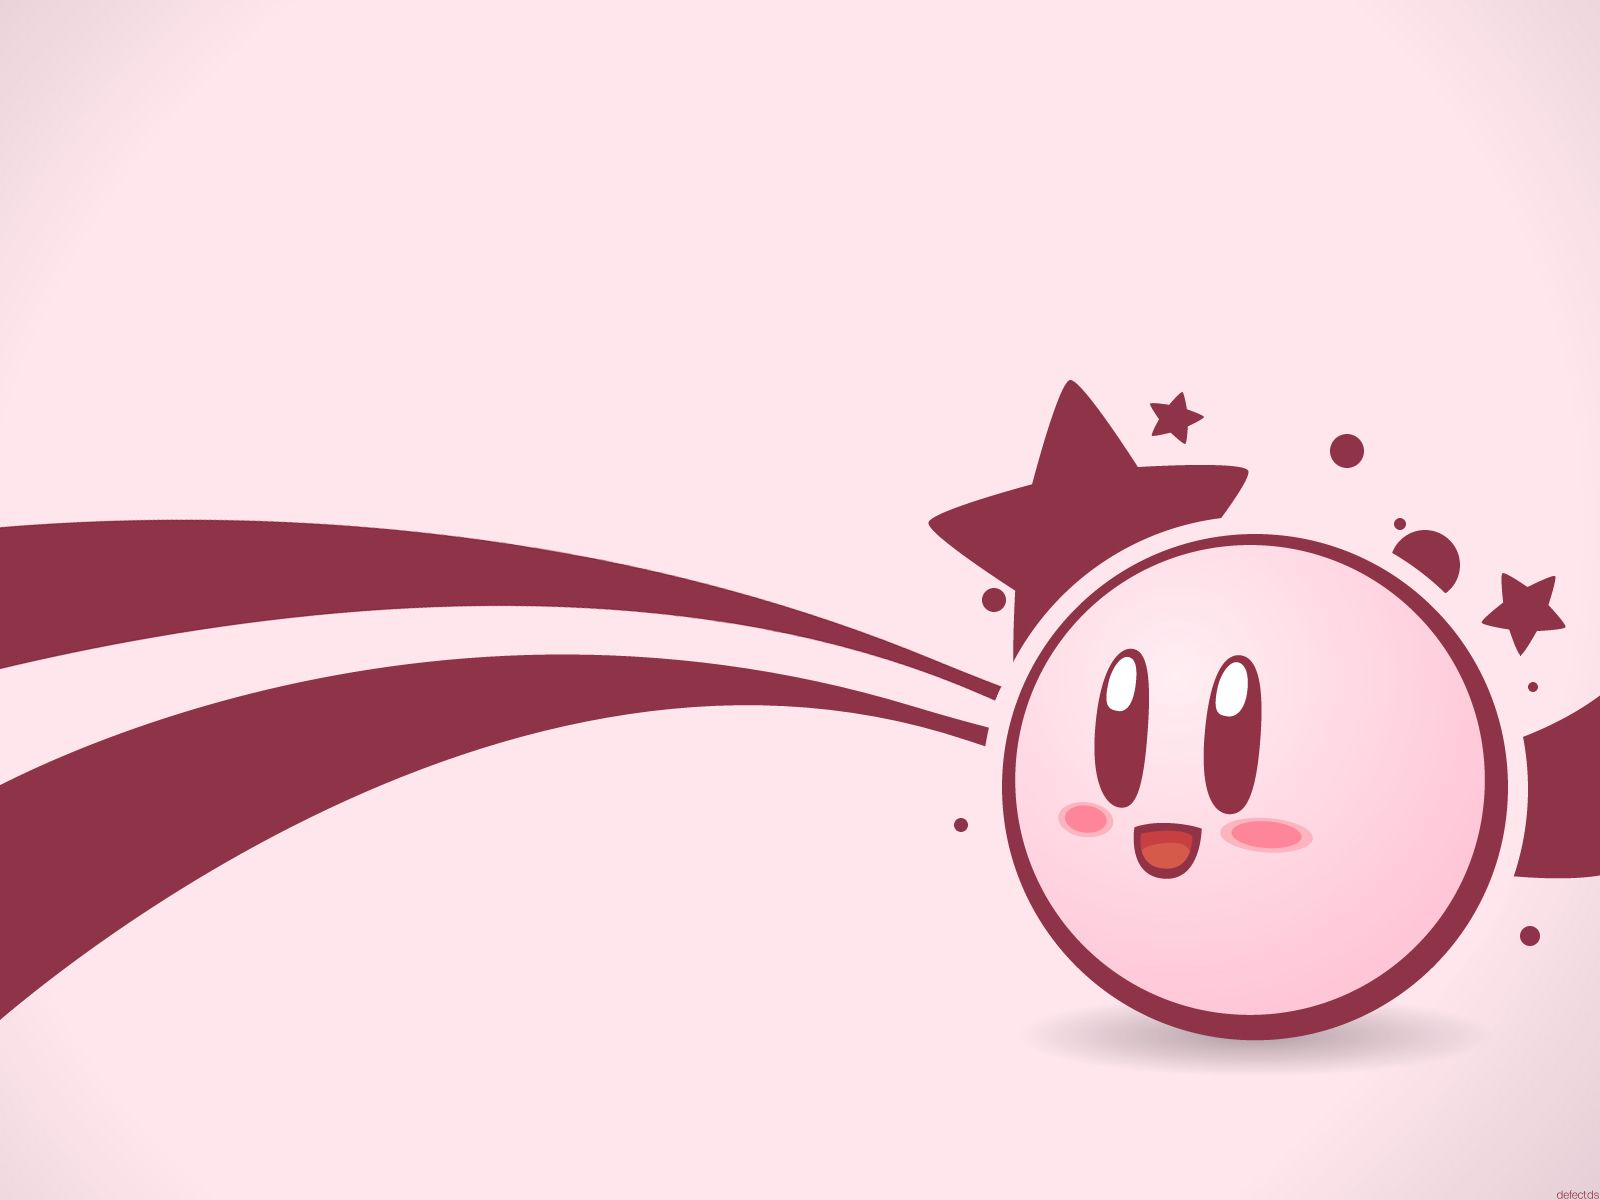 Cute Kirby Wallpaper Kirby Kirby Character Anime Artwork